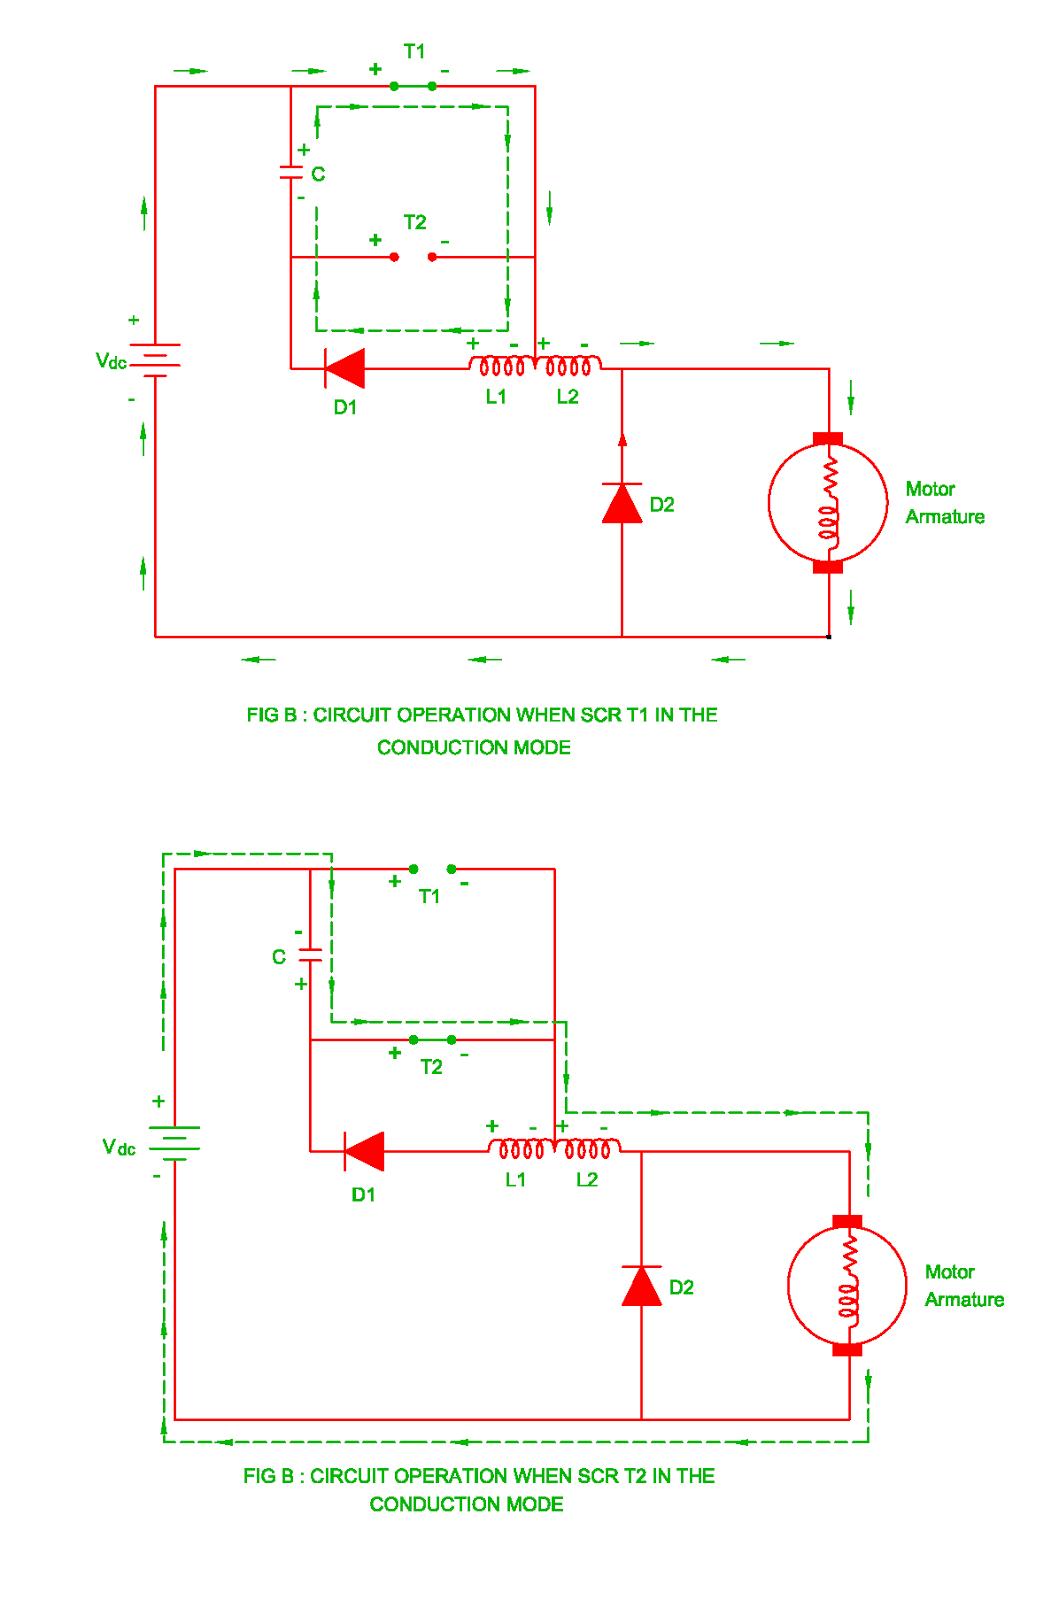 small resolution of jones chopper electrical revolution v rod diagram circuit diagram jones chopper